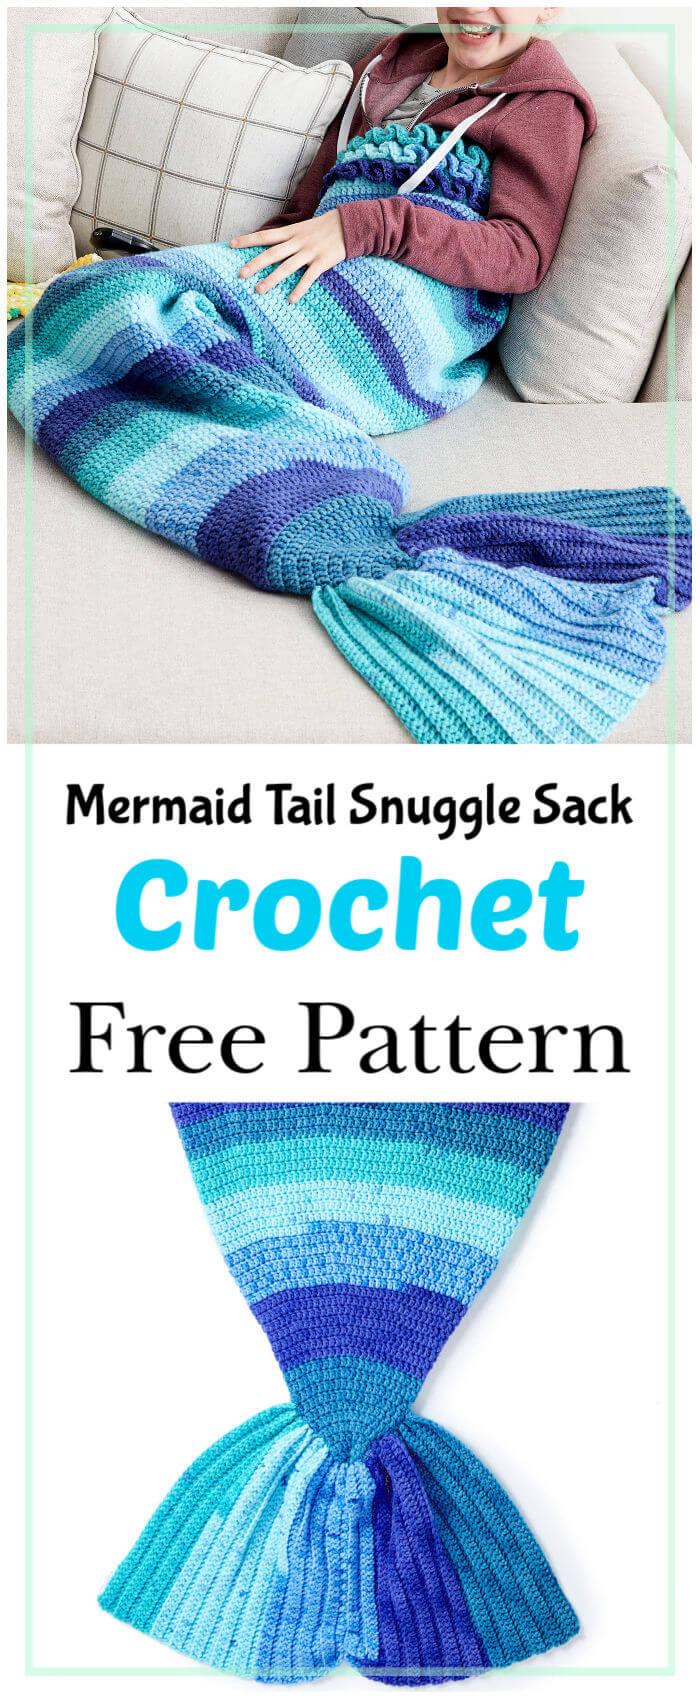 Mermaid Tail Snuggle Sack Free Crochet Pattern